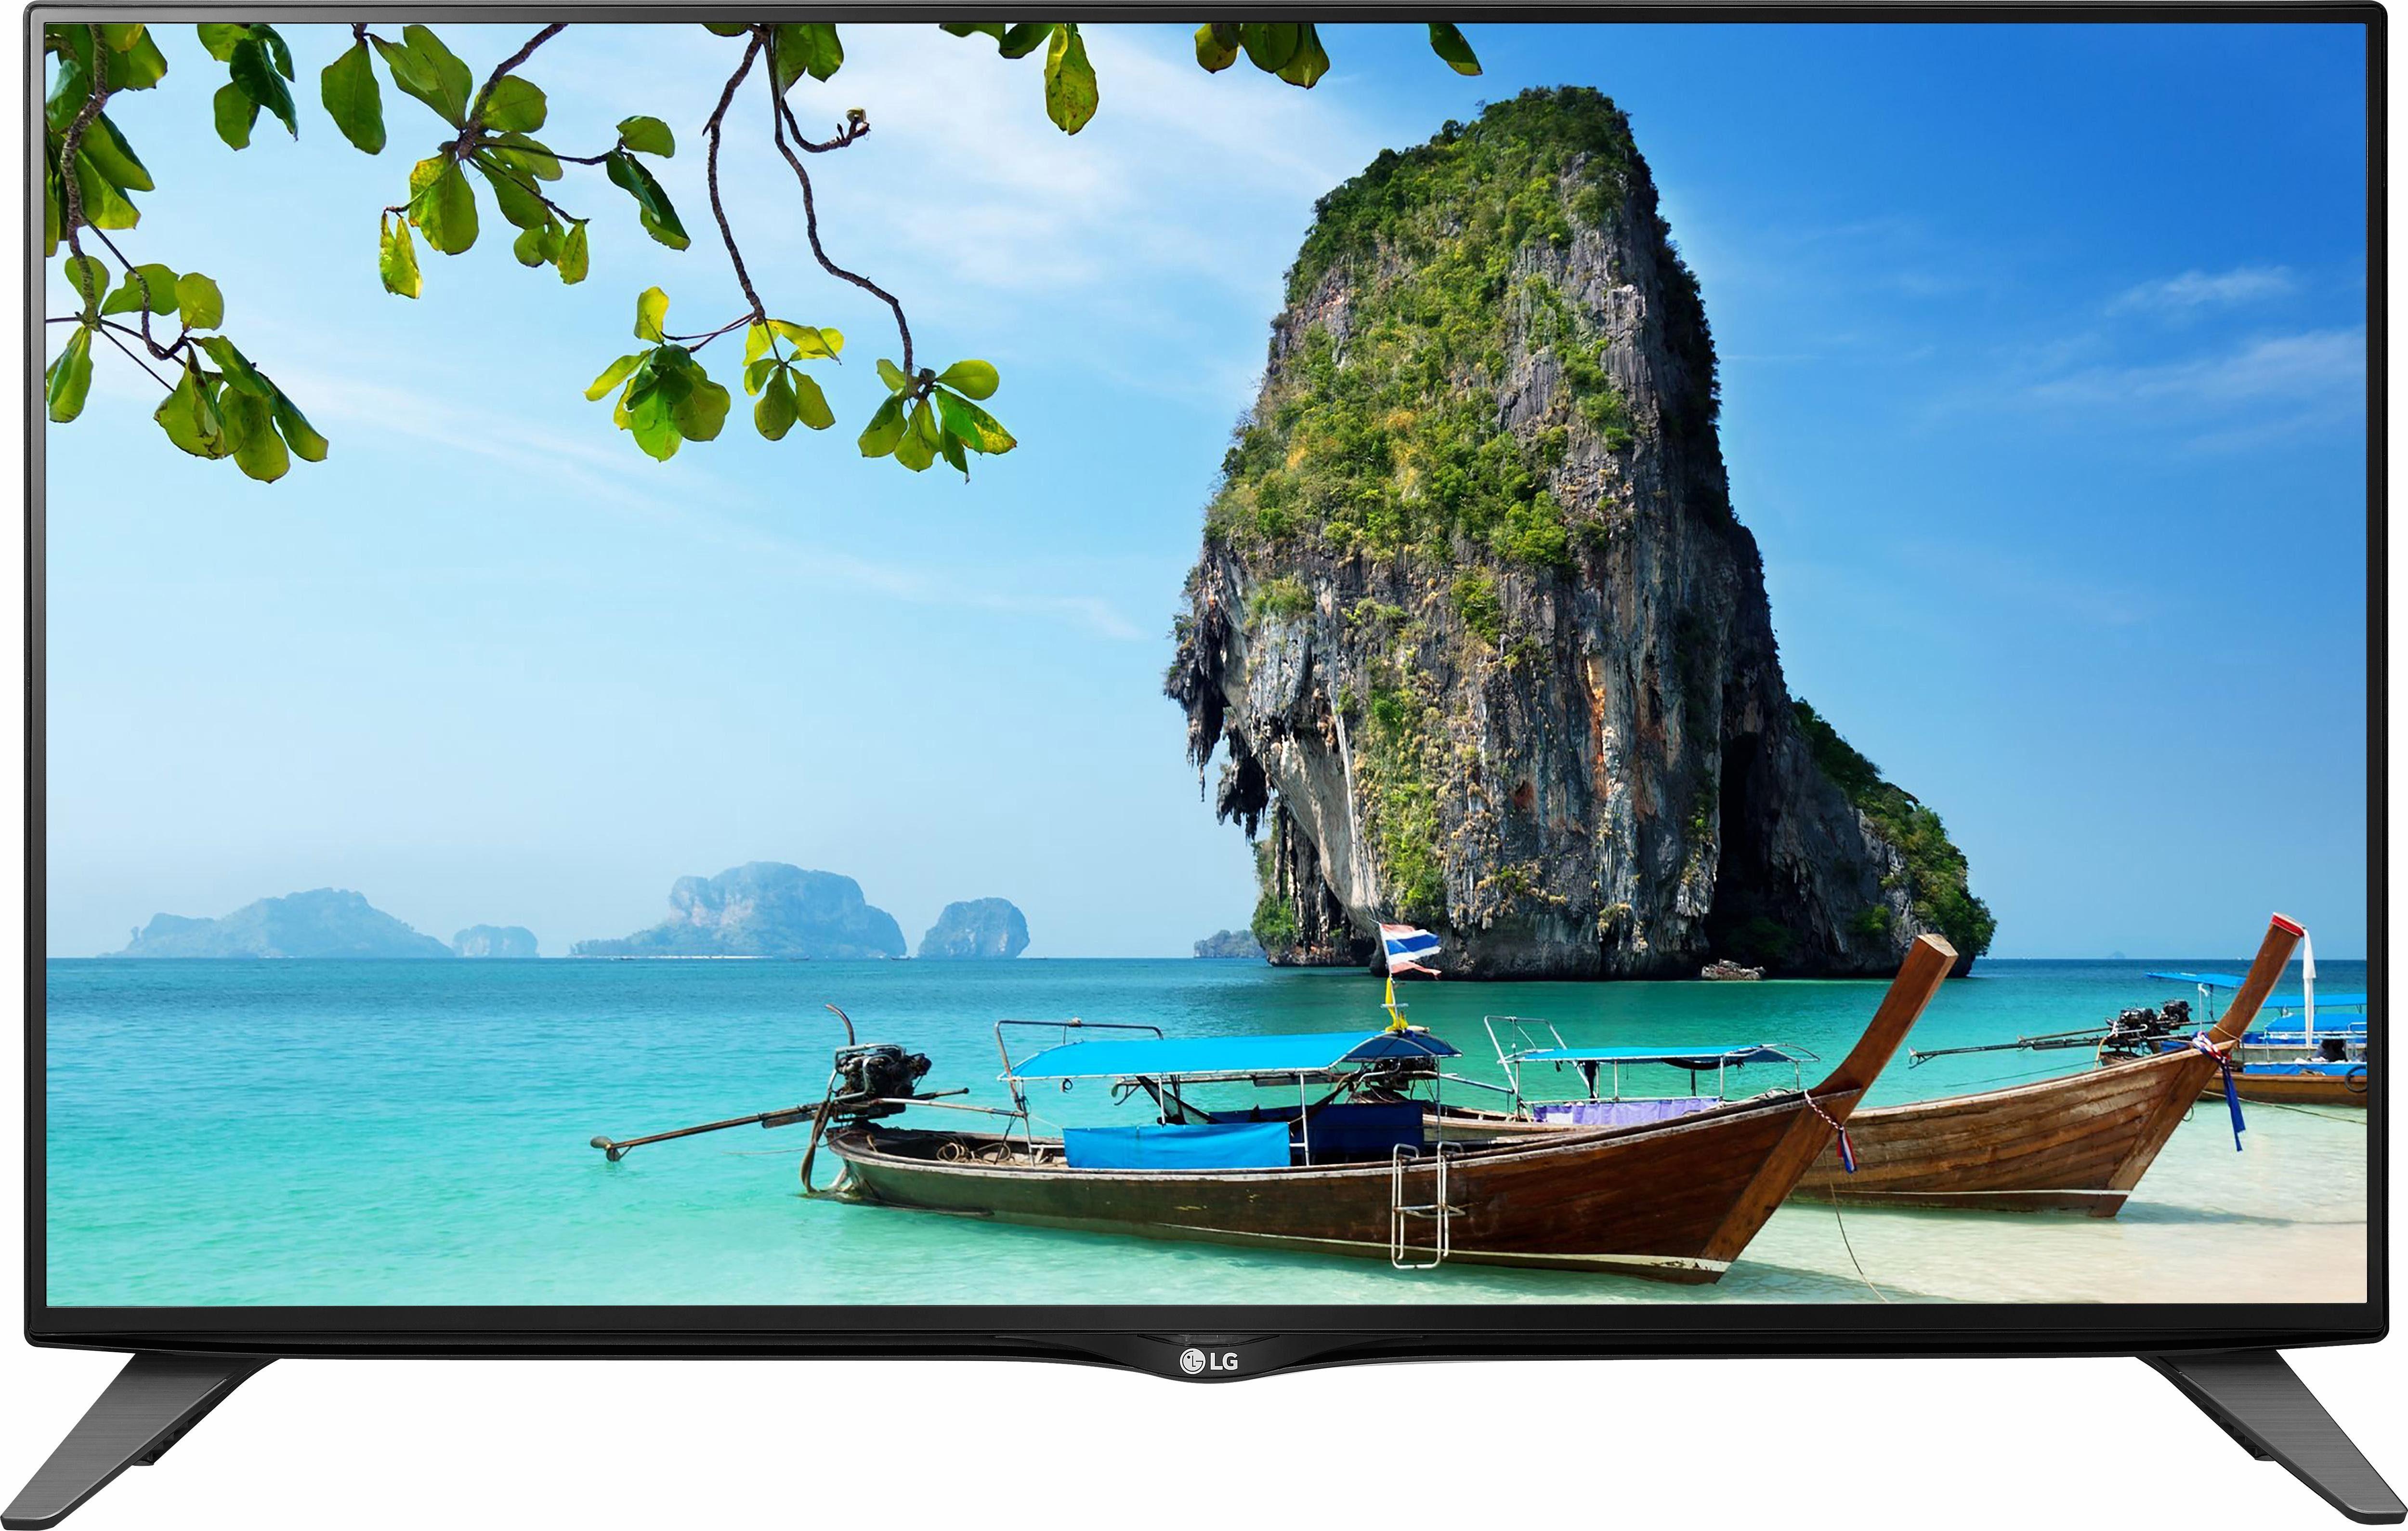 LG 40UH630V, LED Fernseher, 100 cm (40 Zoll), 2160p (4K Ultra HD), Smart-TV